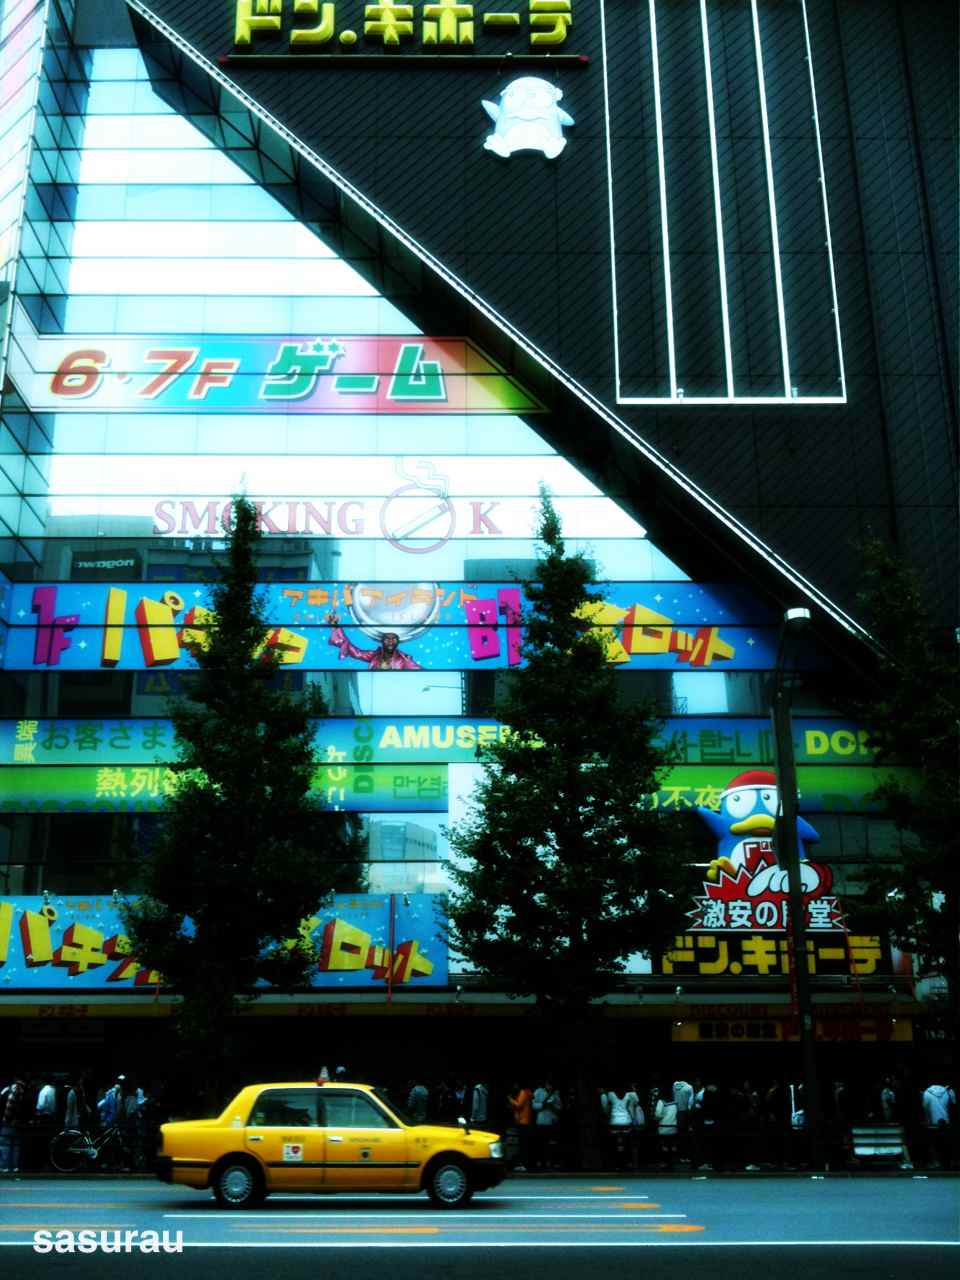 4335715-photo_by_camerakit.jpg